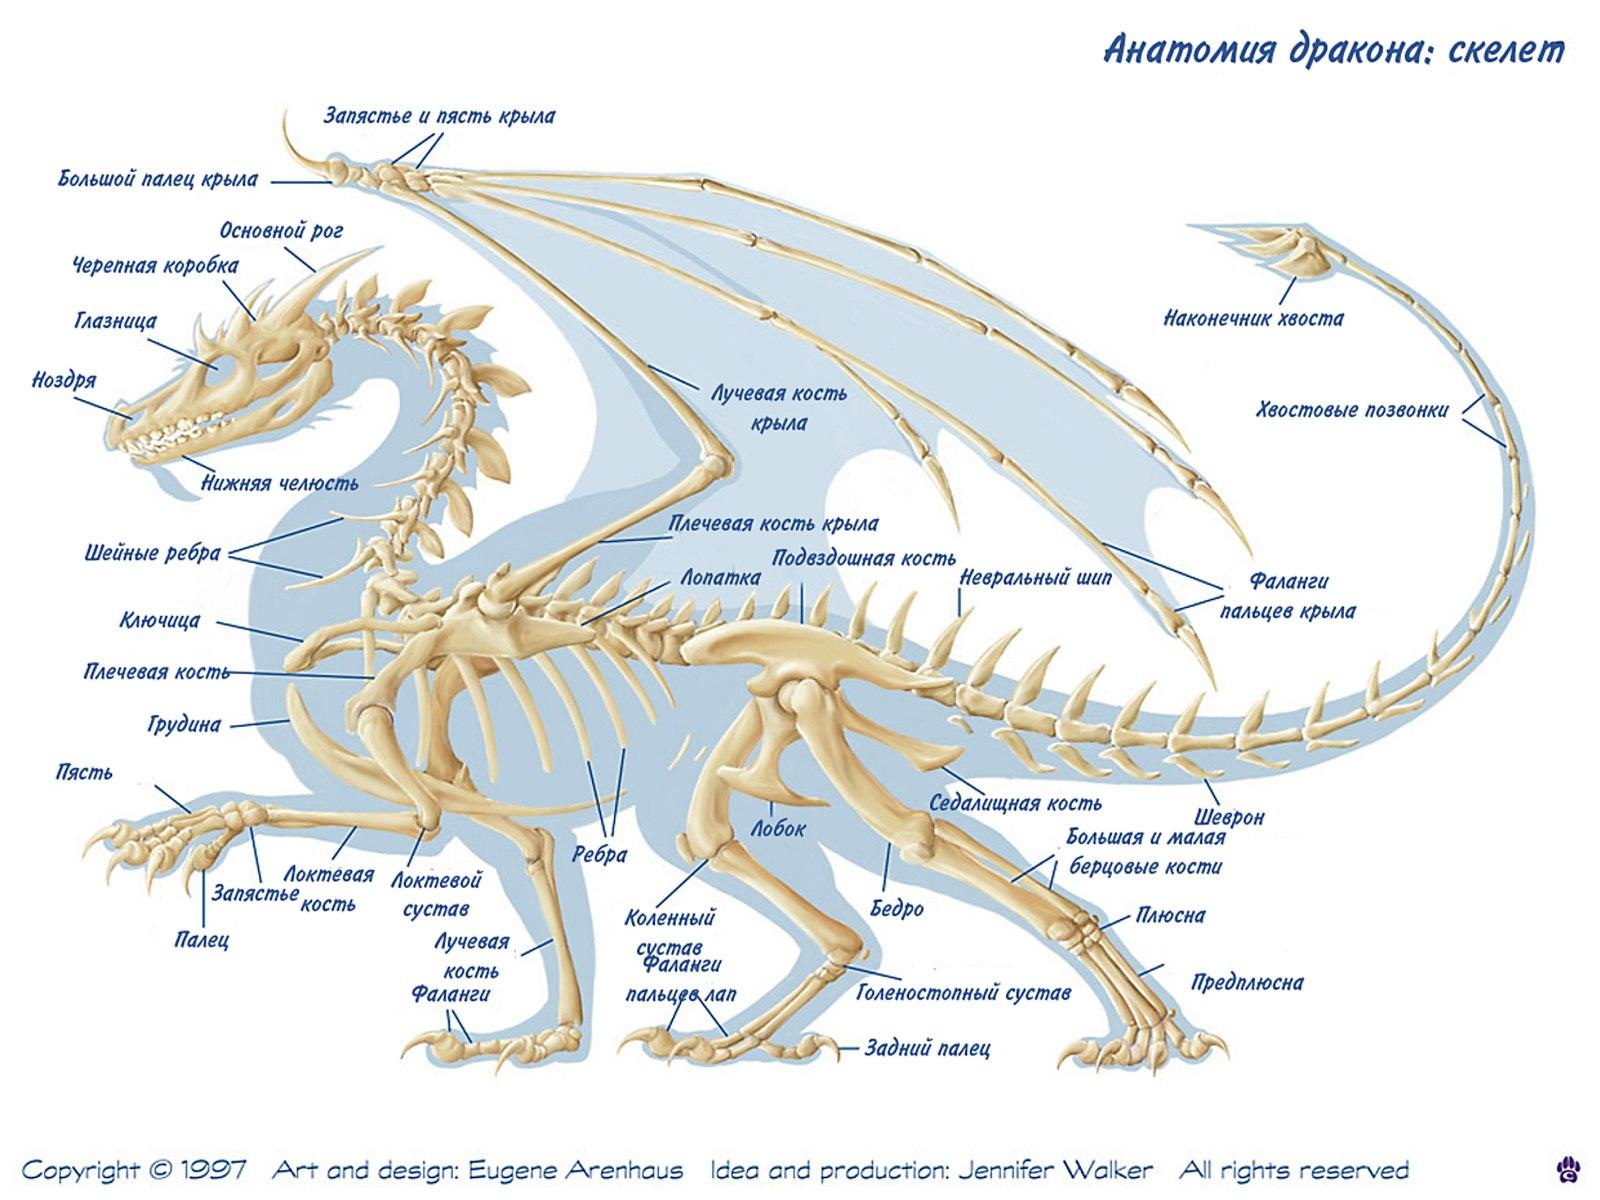 http://dragons-nest.ru/dragons/rasa_drakonov/img/024.jpg